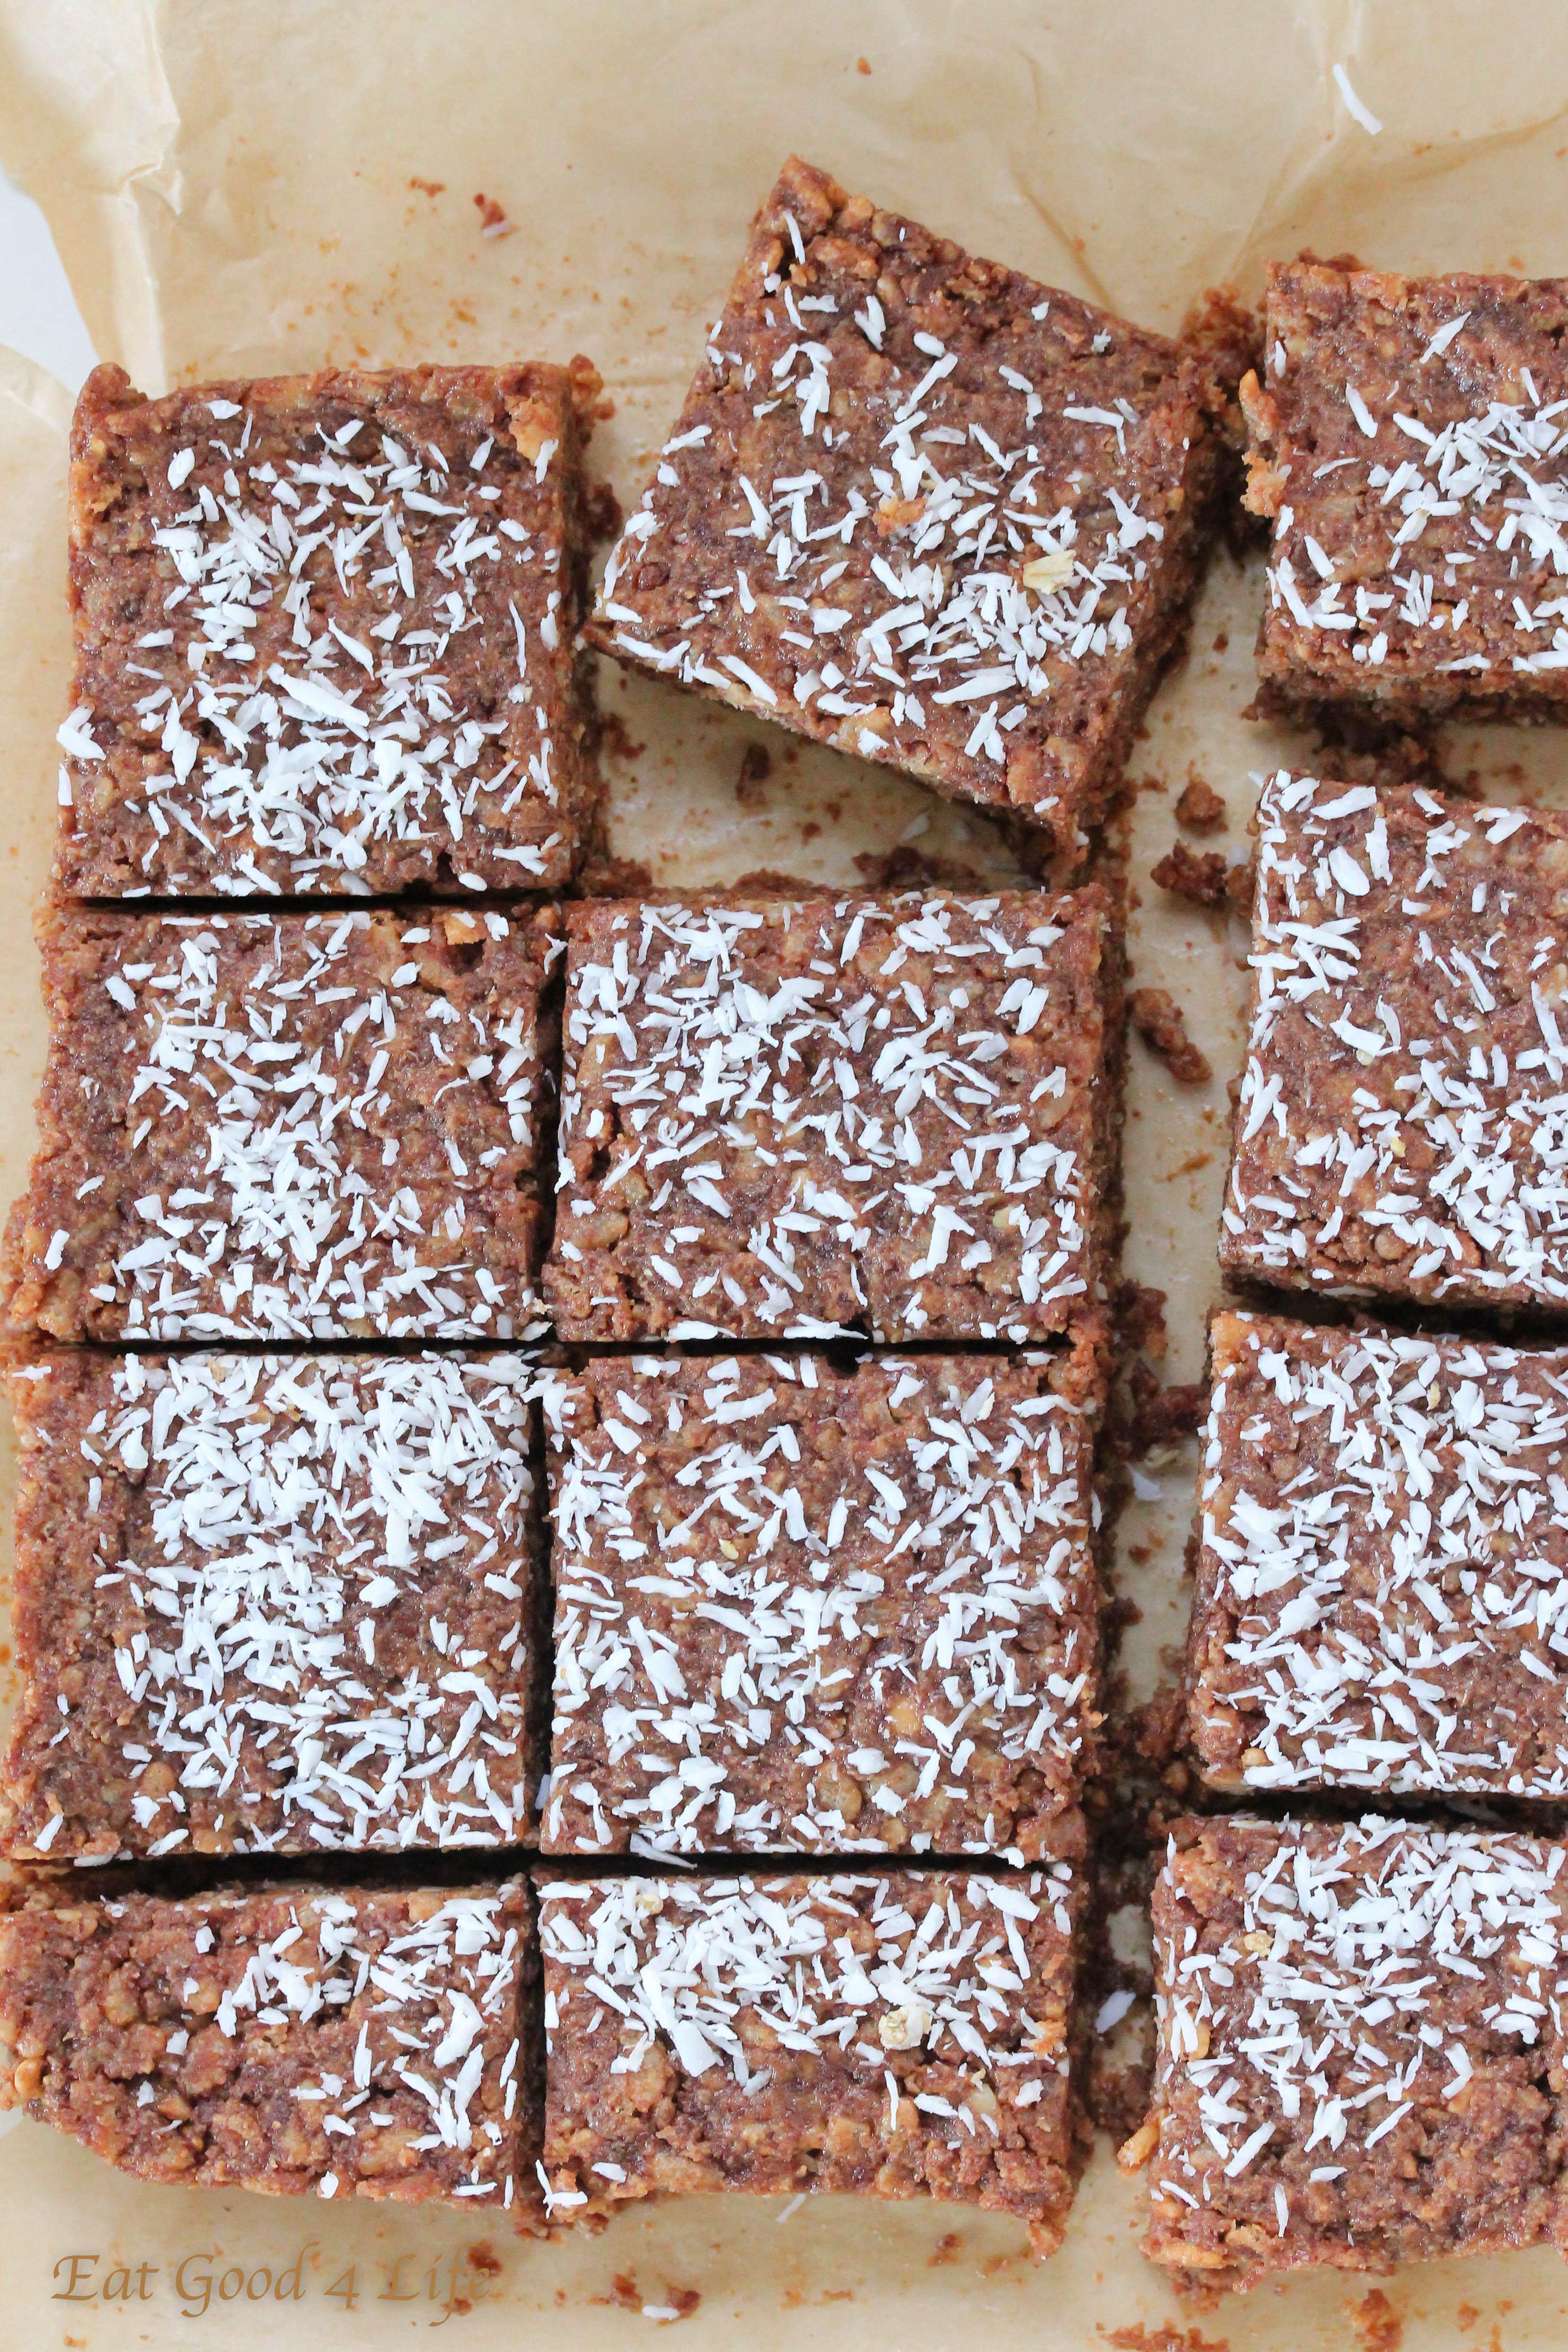 Chocolate rice crispy treats